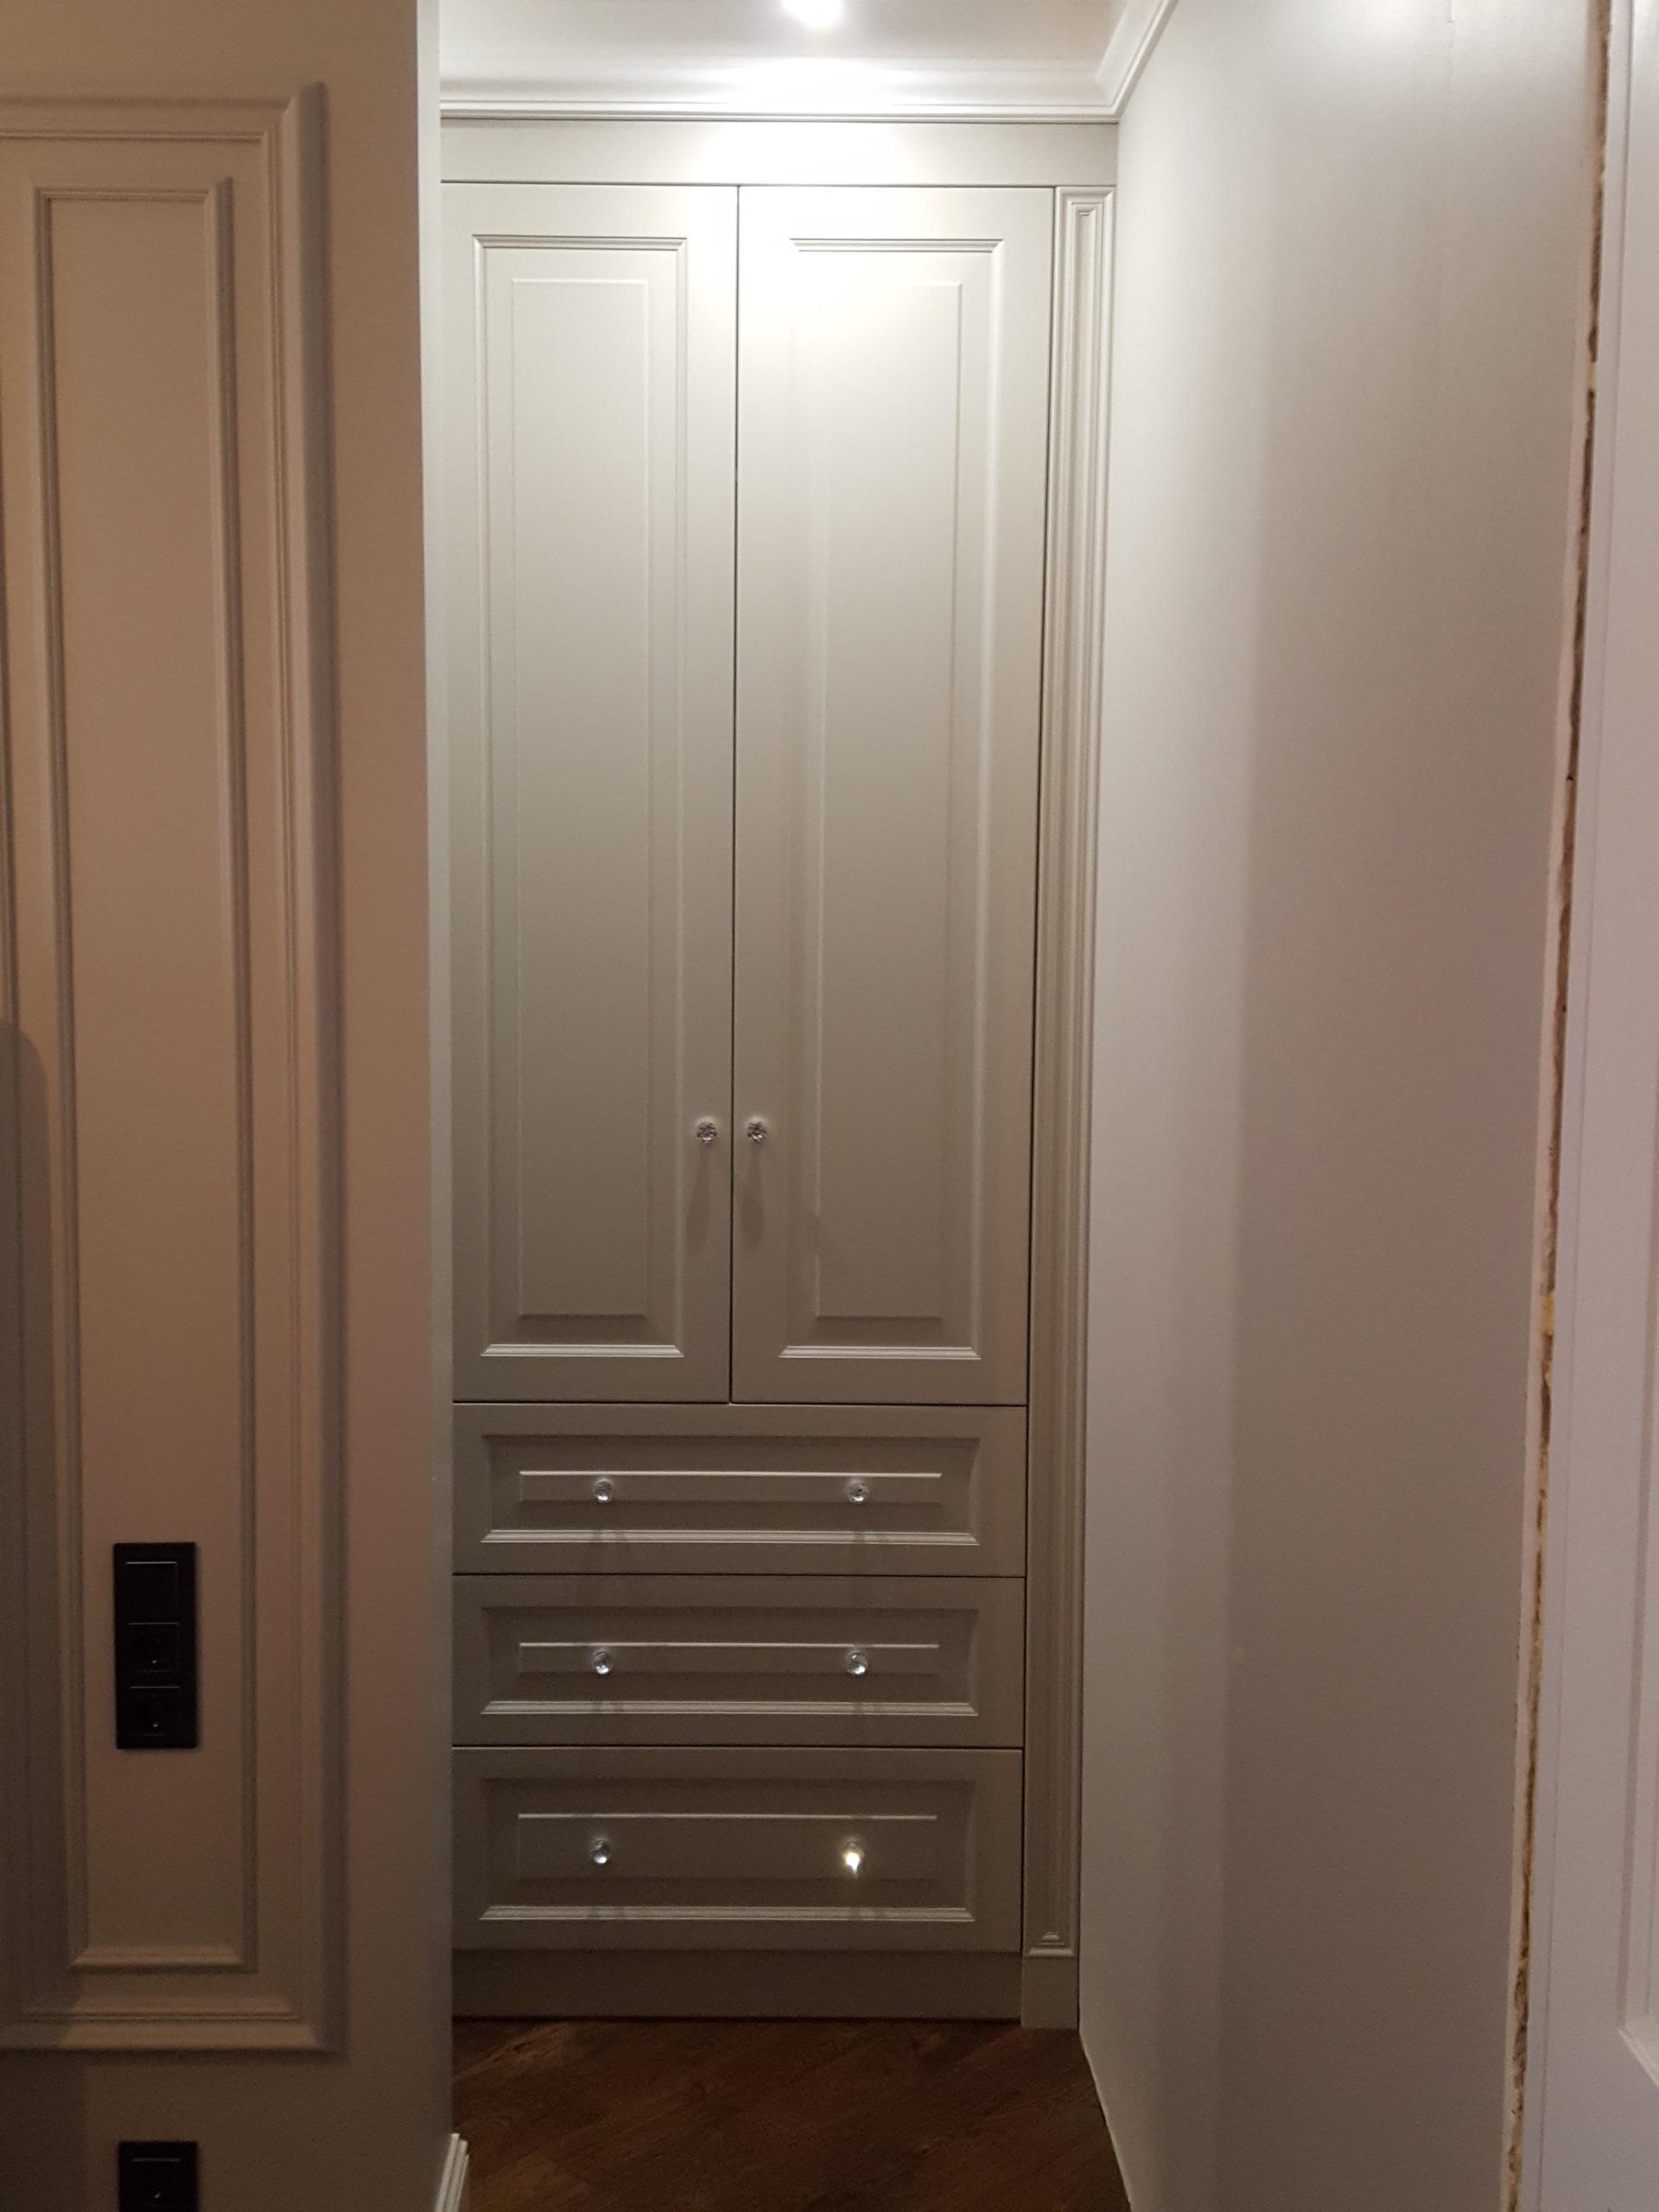 Шкафы - фото 3